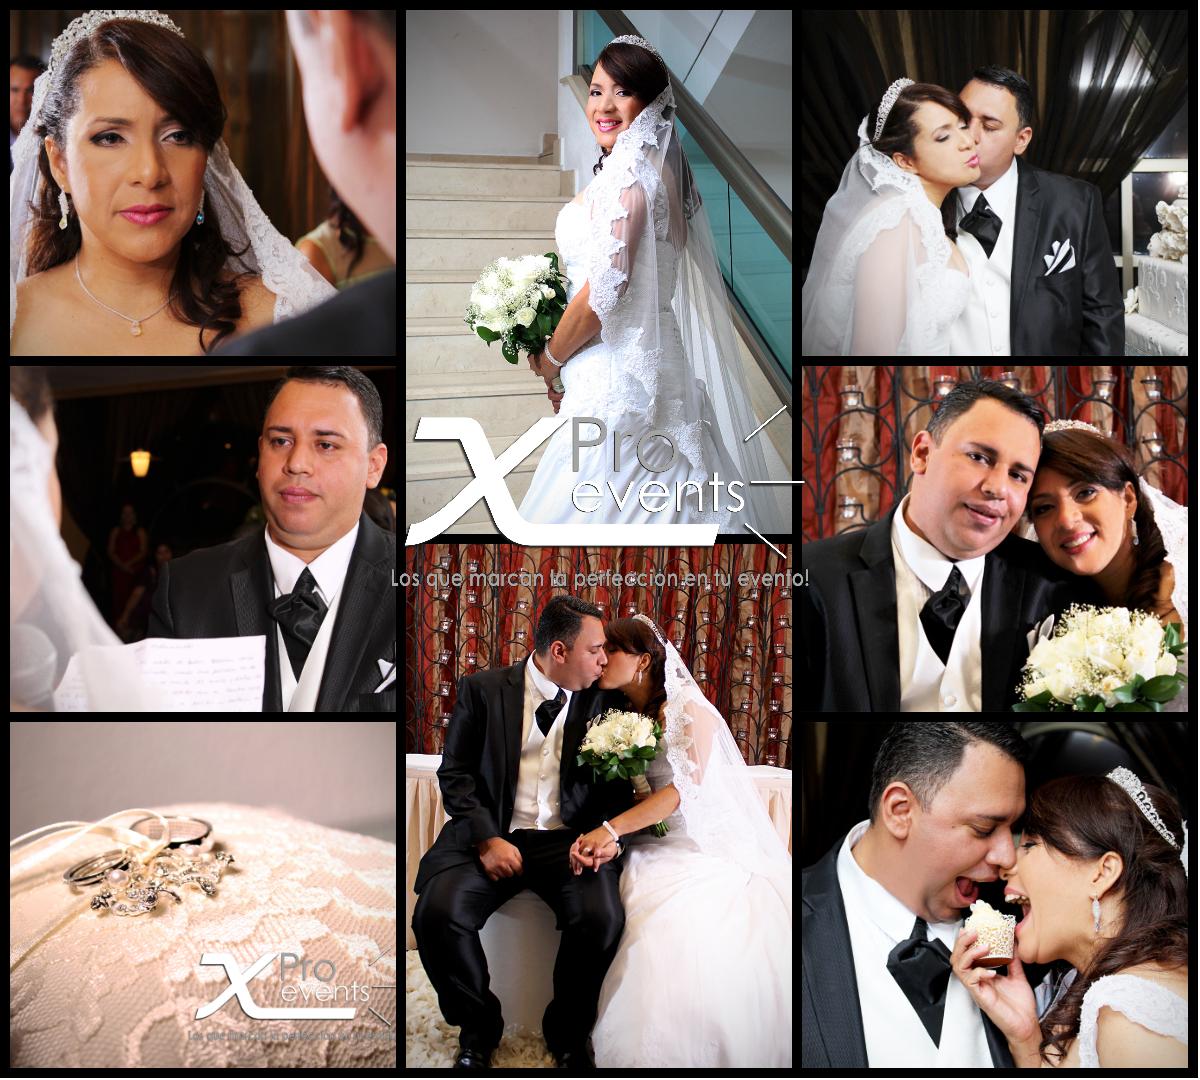 www.Xproevents - Collage boda Giovanny Gonzalez & Ruth Santos (Hotel Hilton).jpg